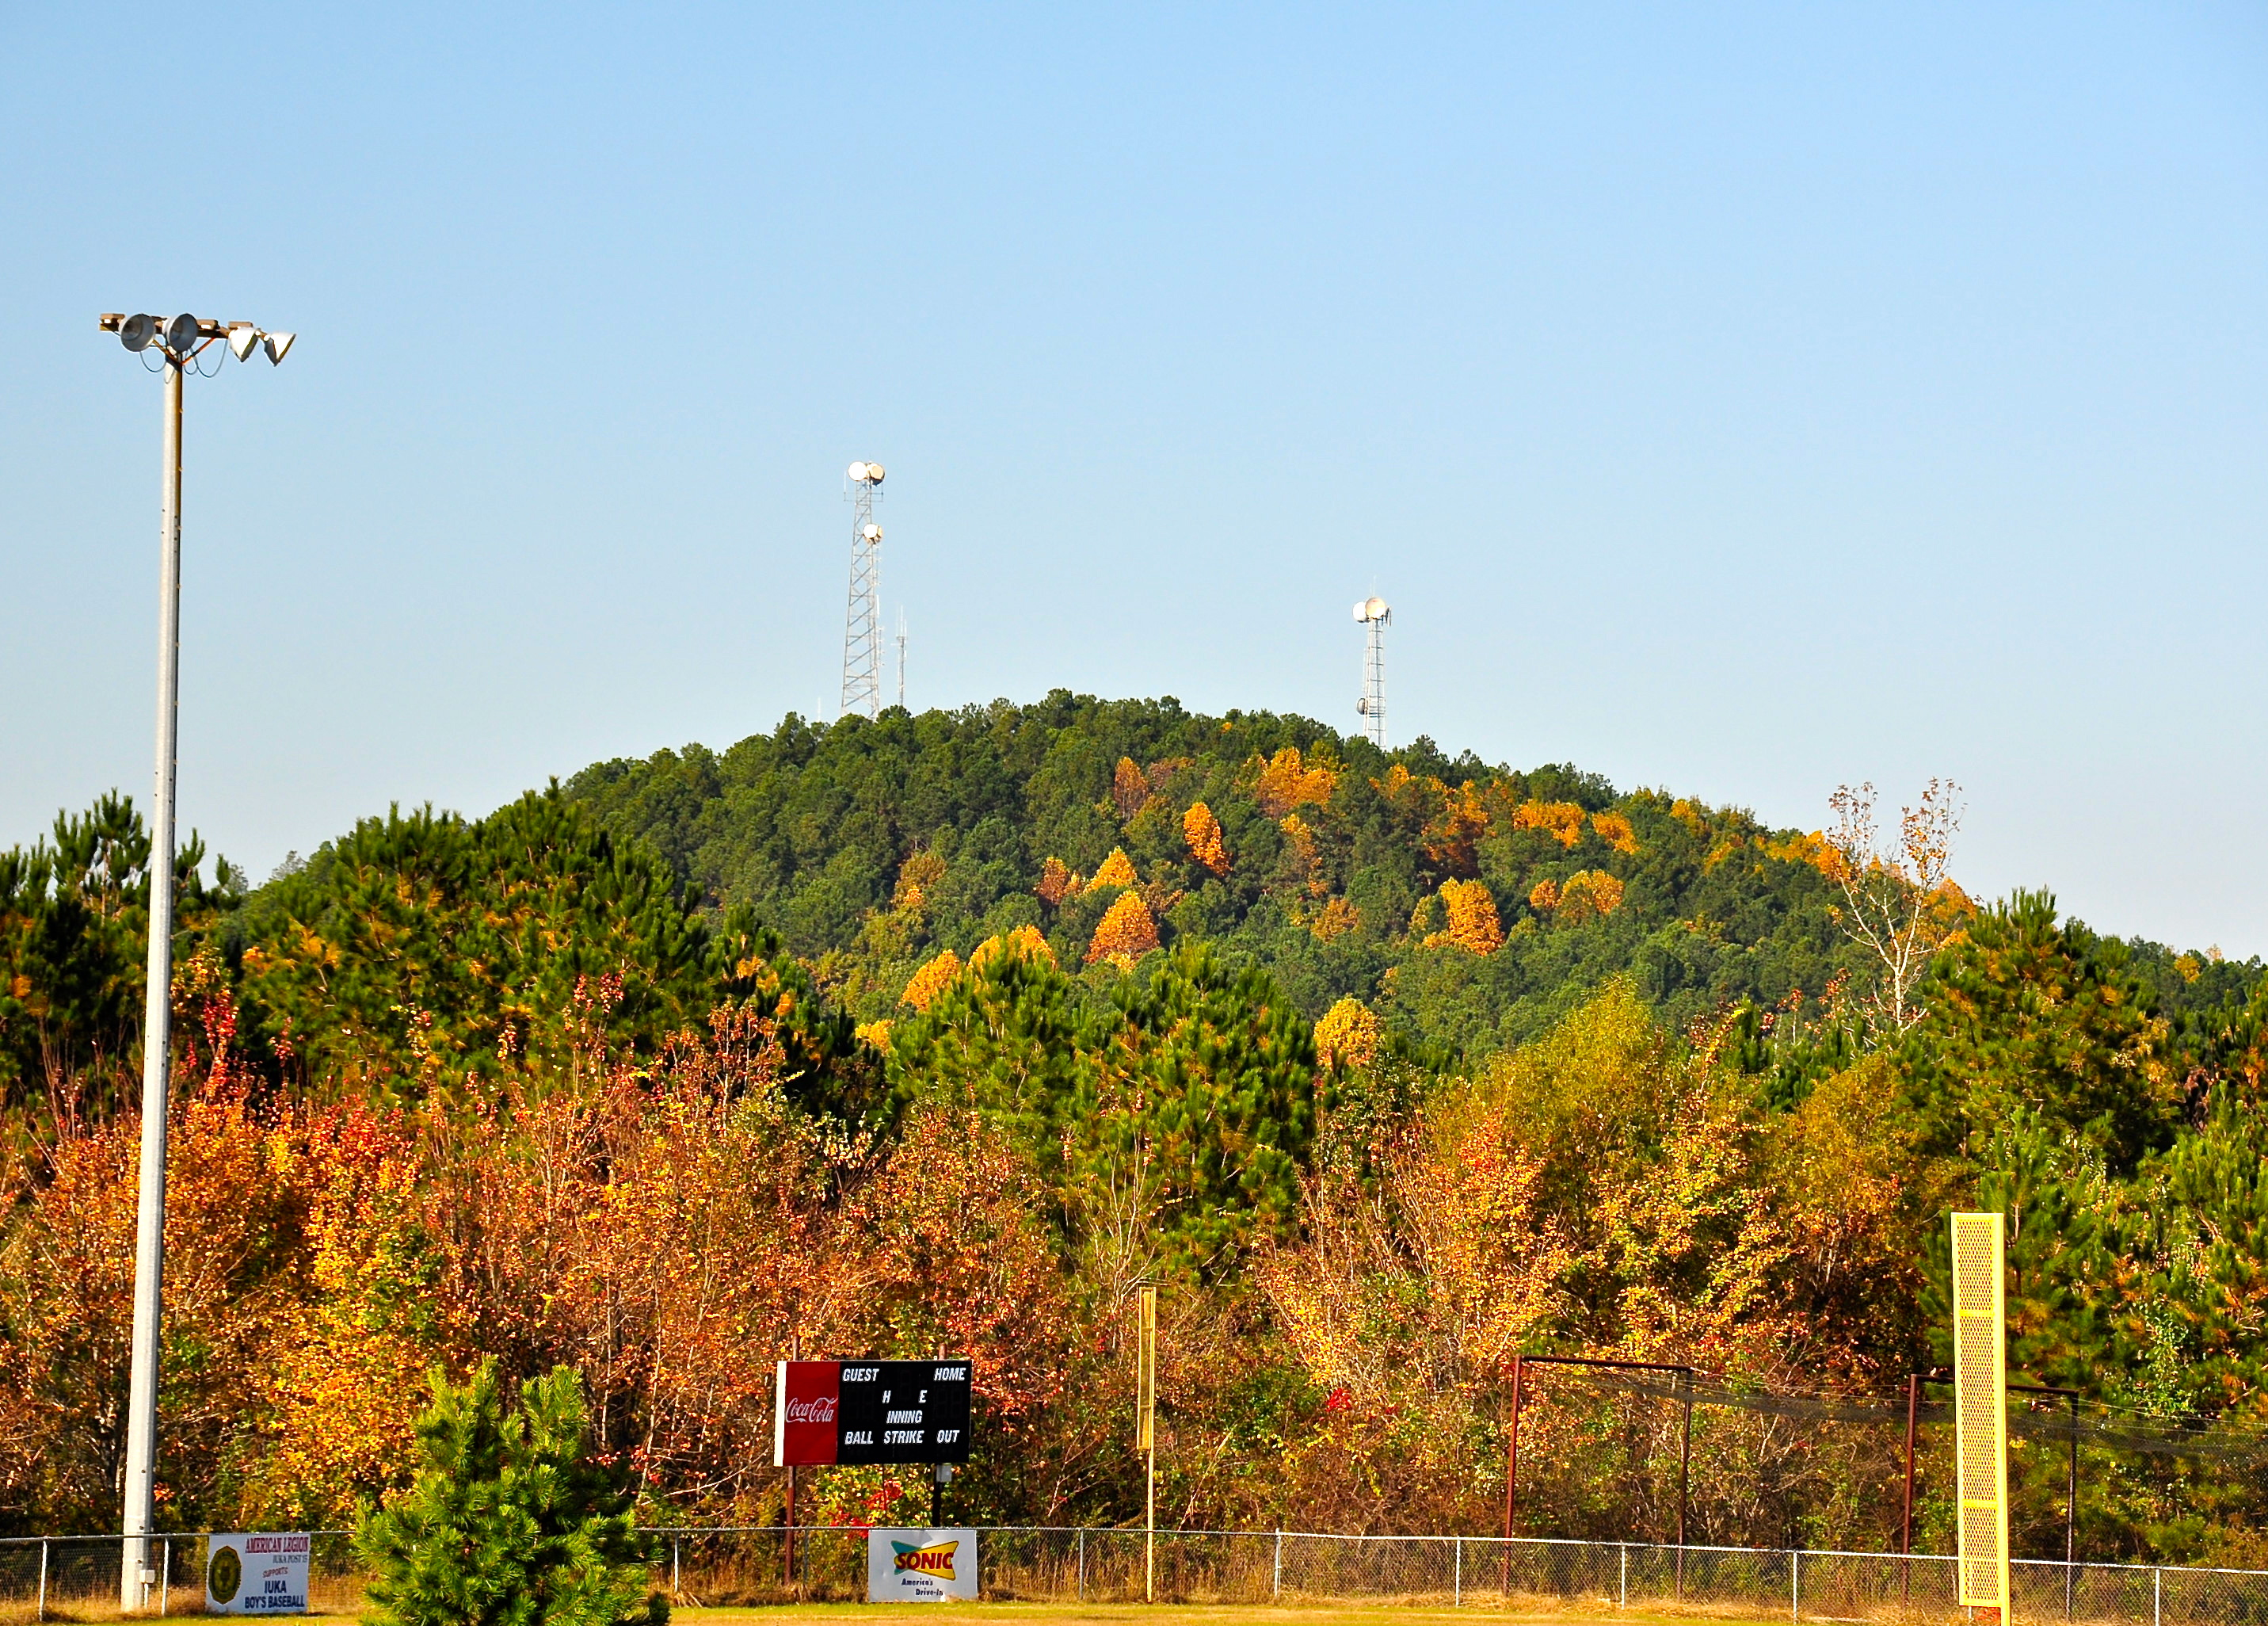 Mississippi >> File:Woodall Mountain Mississippi.JPG - Wikimedia Commons